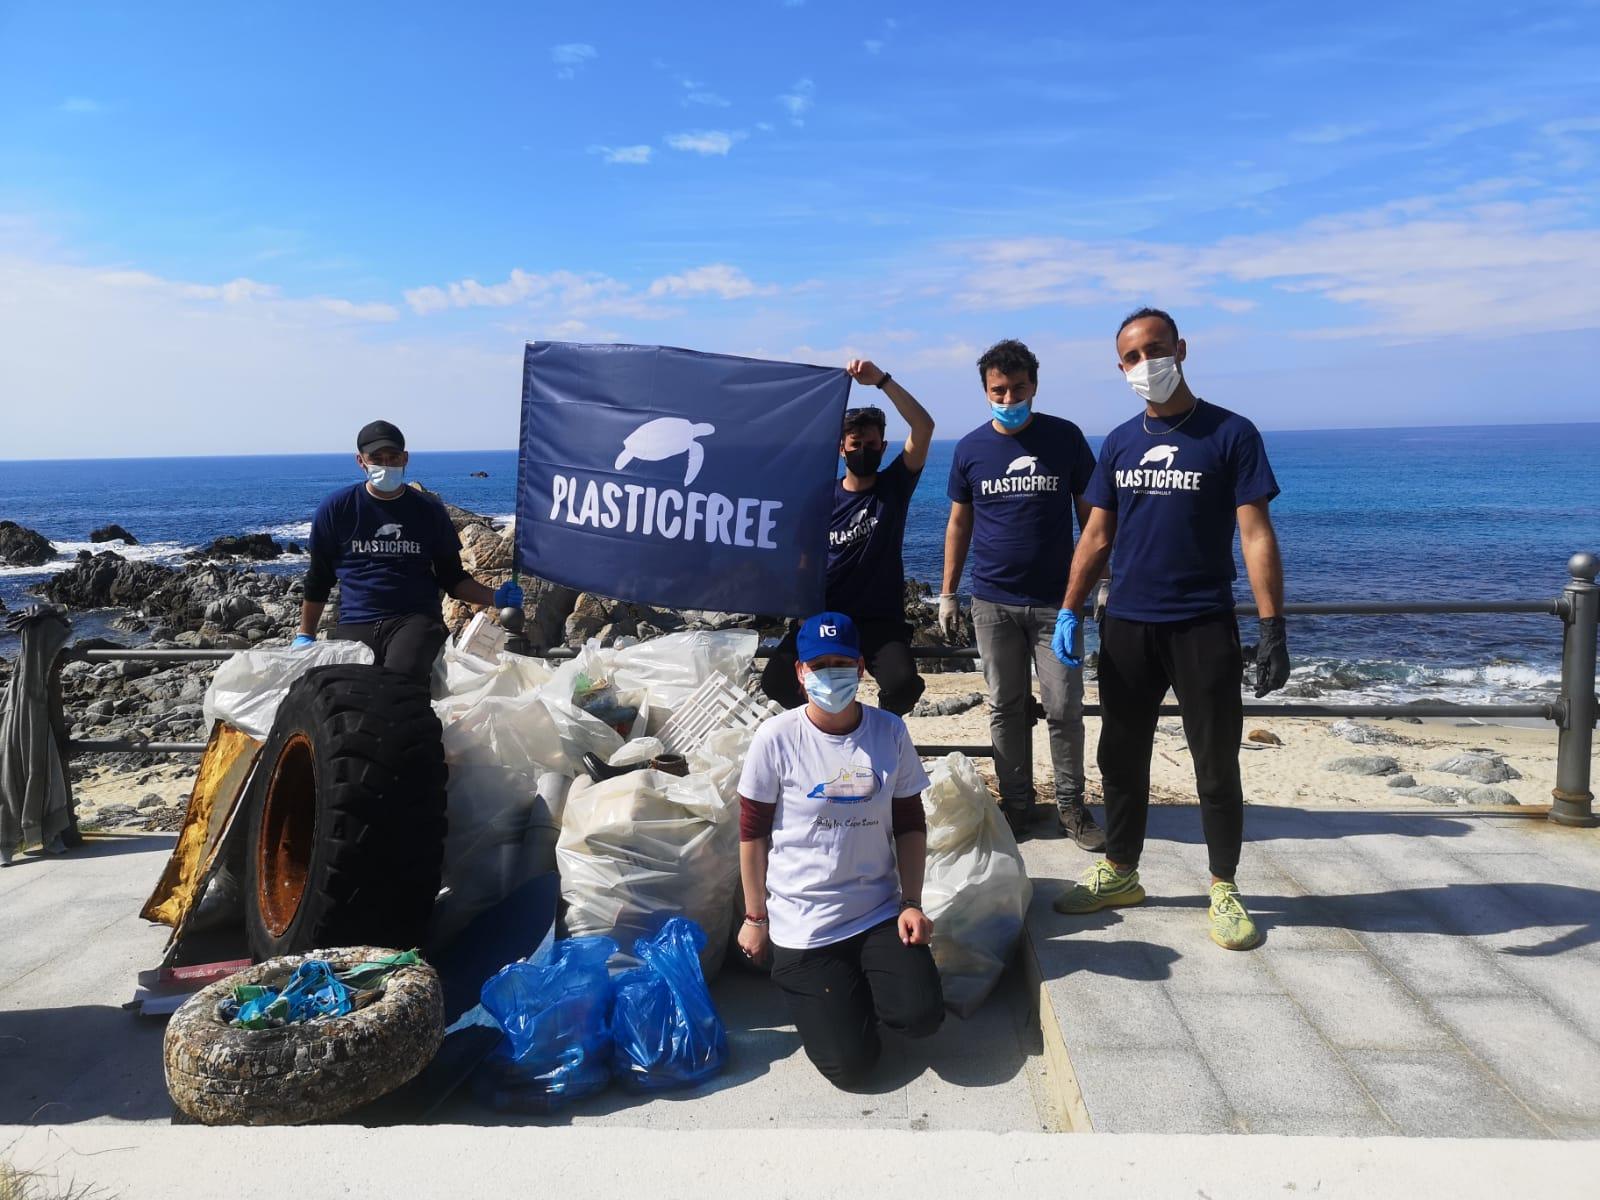 "L'associazione ambientale ""Plastic free"" a Santa Maria: raccolti 150 kg di plastica in una mattinata"